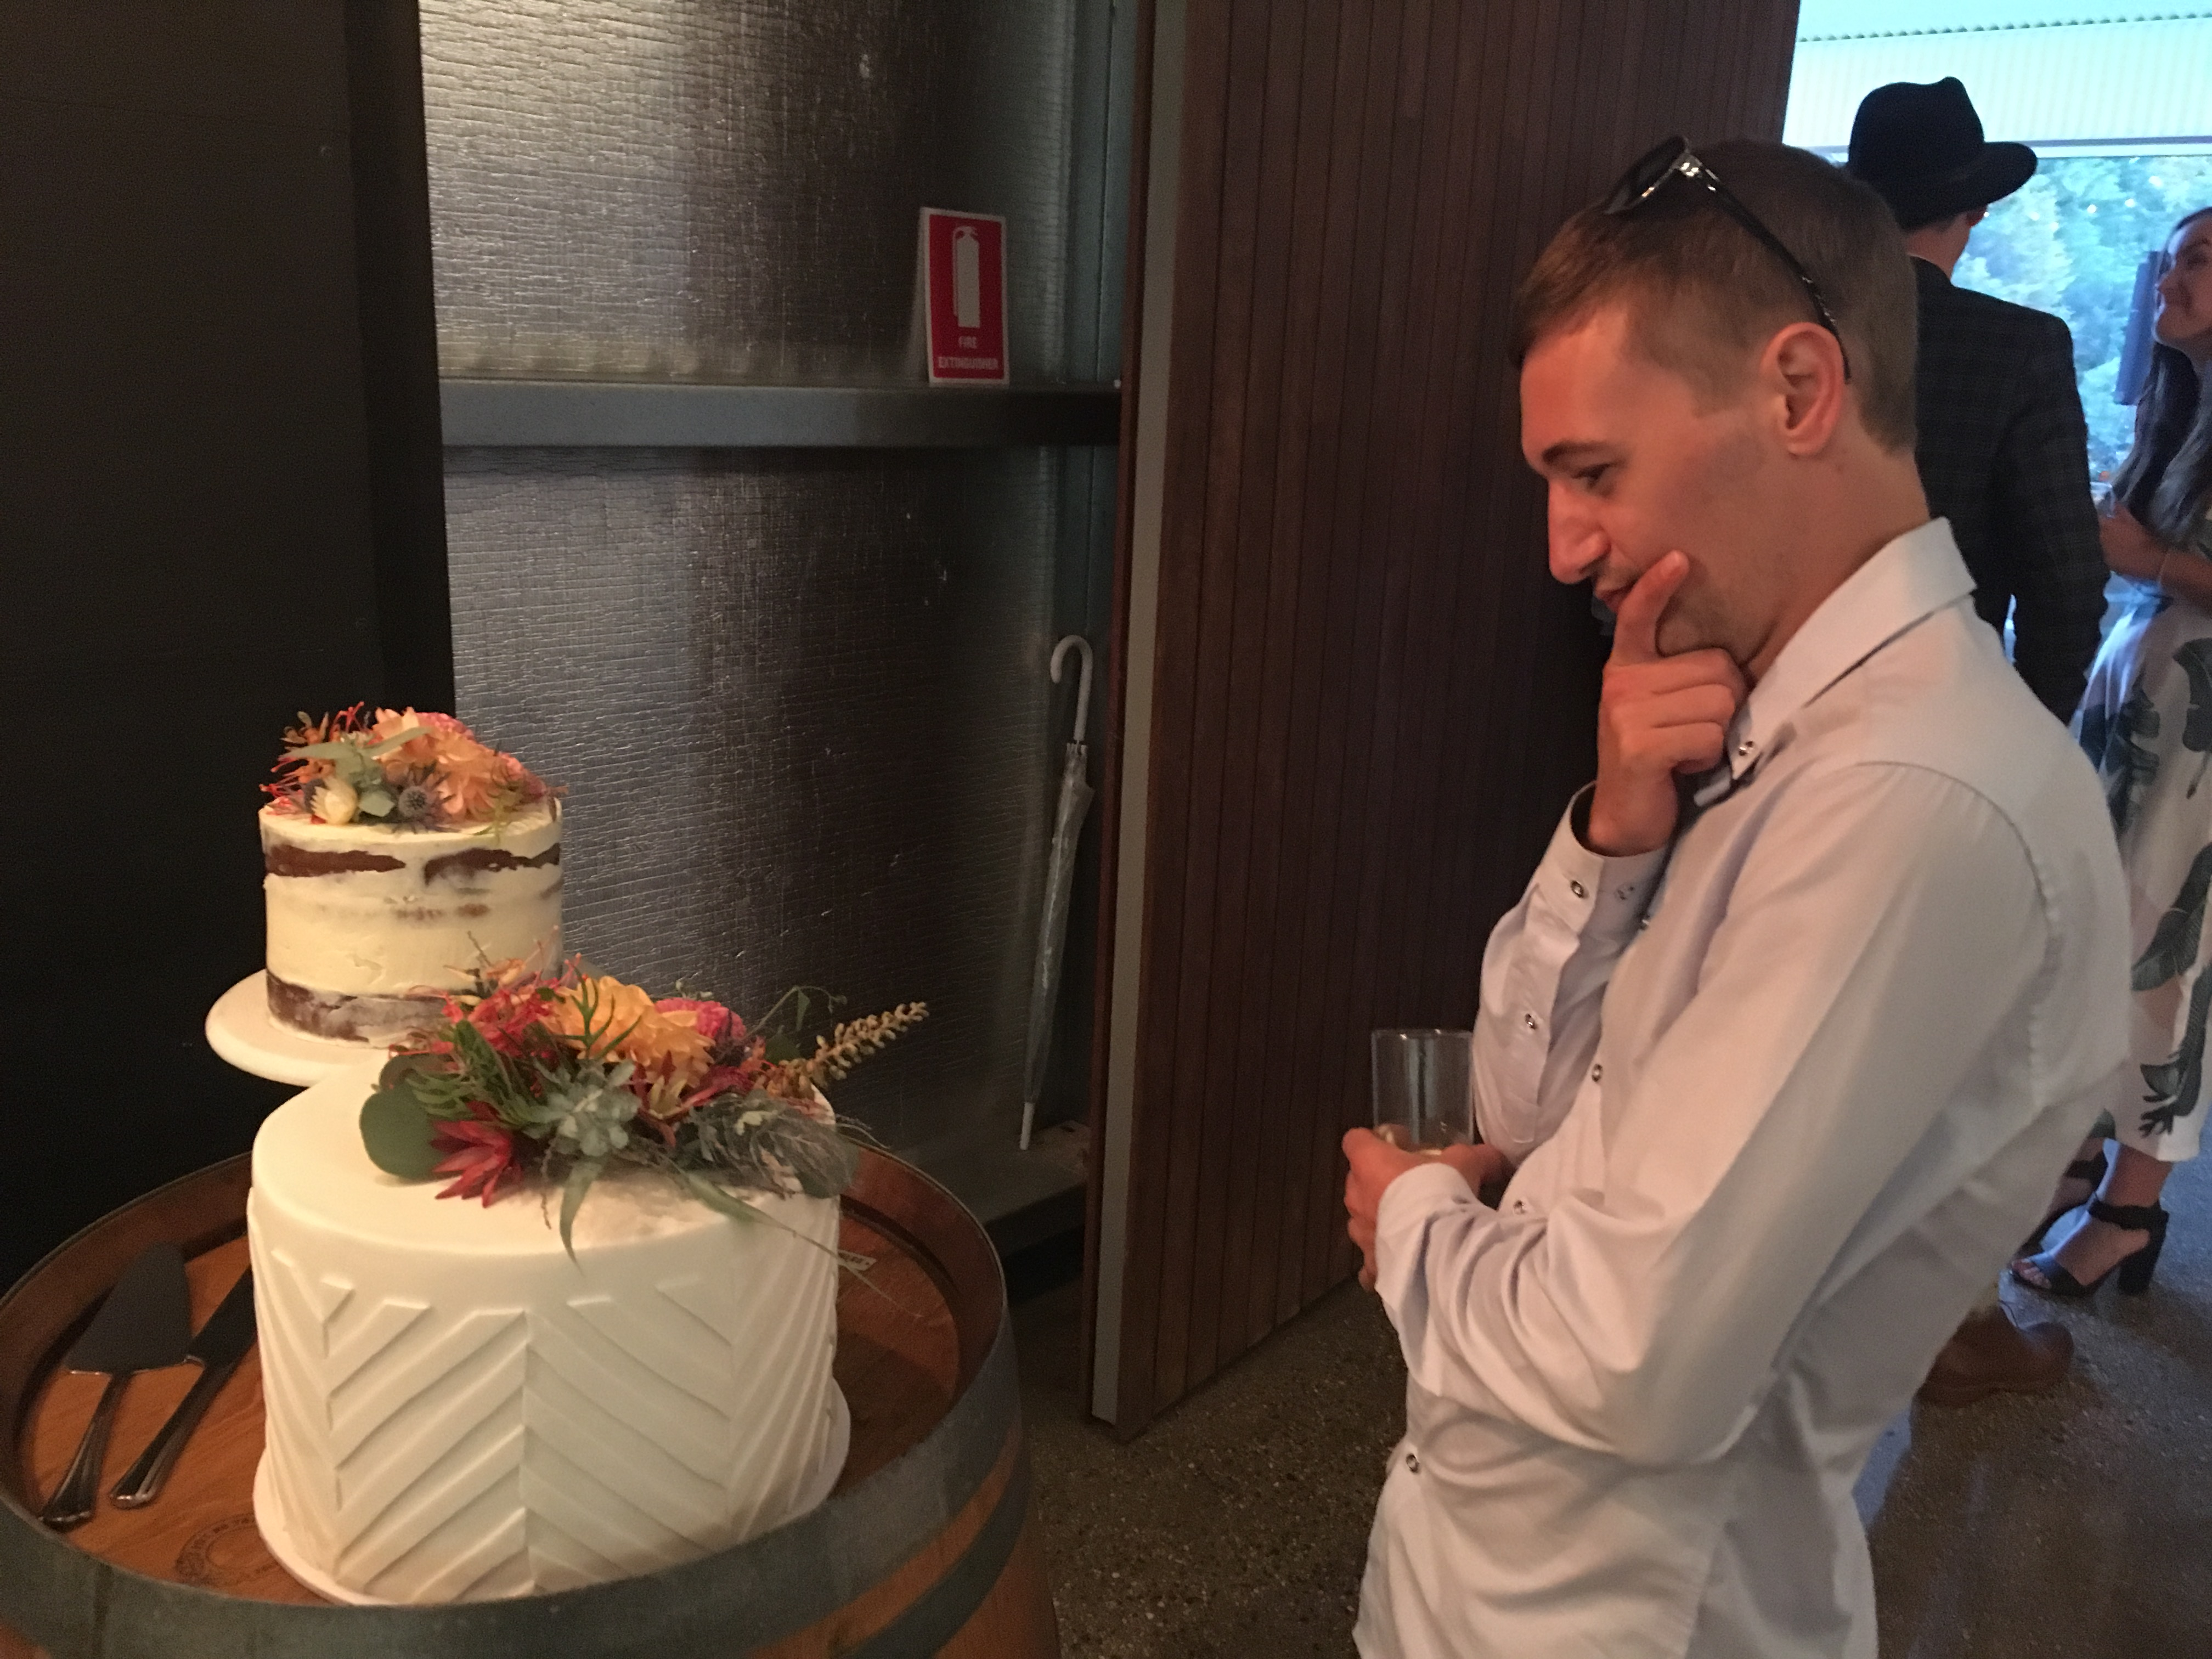 Todd cake